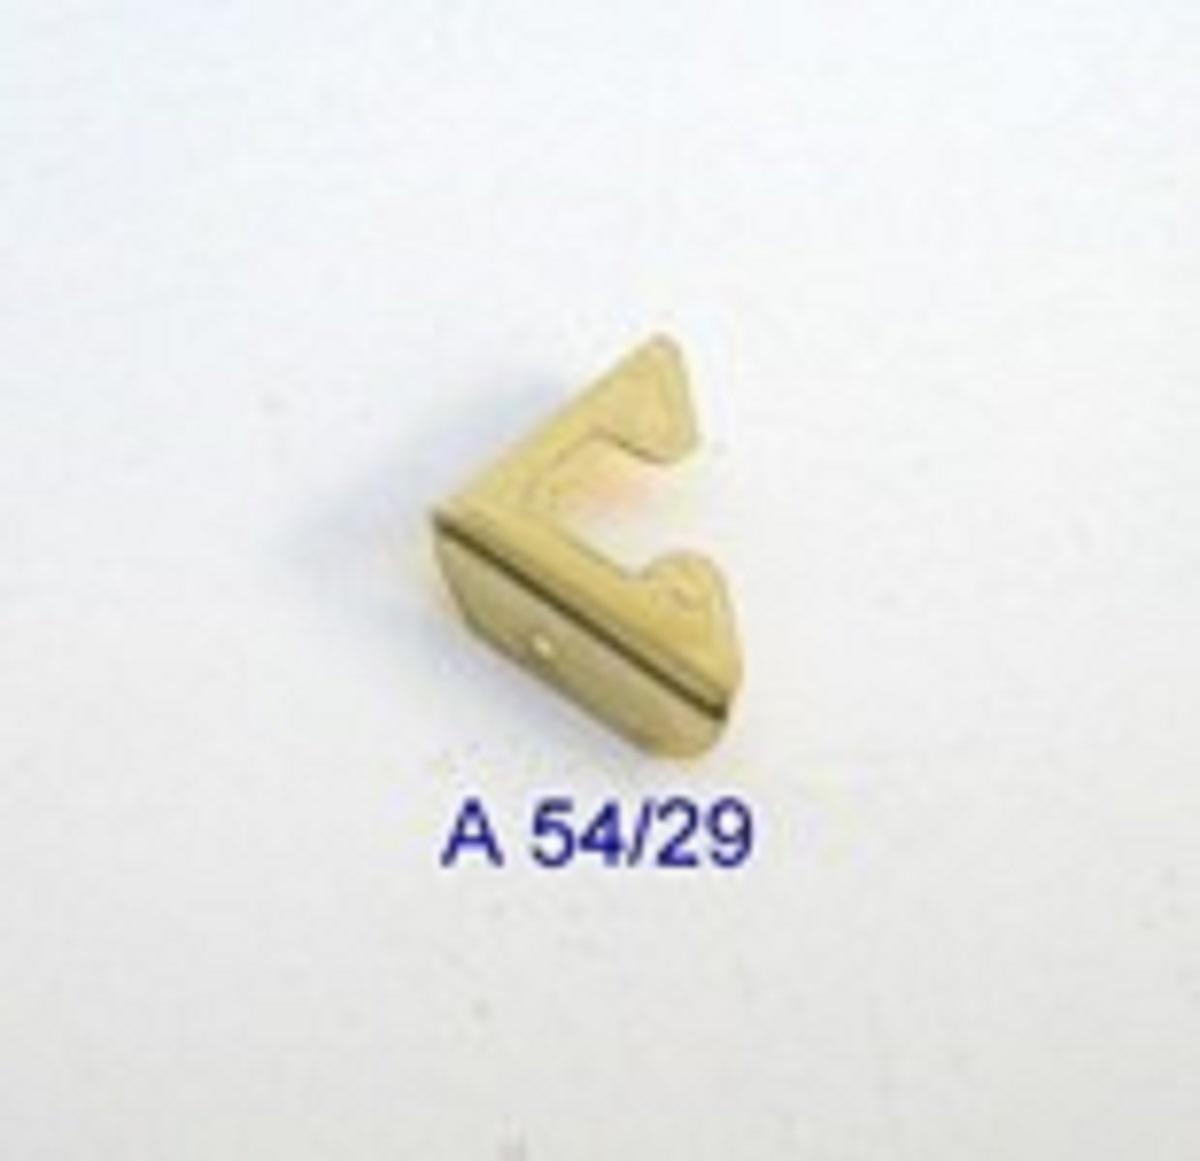 Canto p/ Caixa 15mm x 15mm Latonado